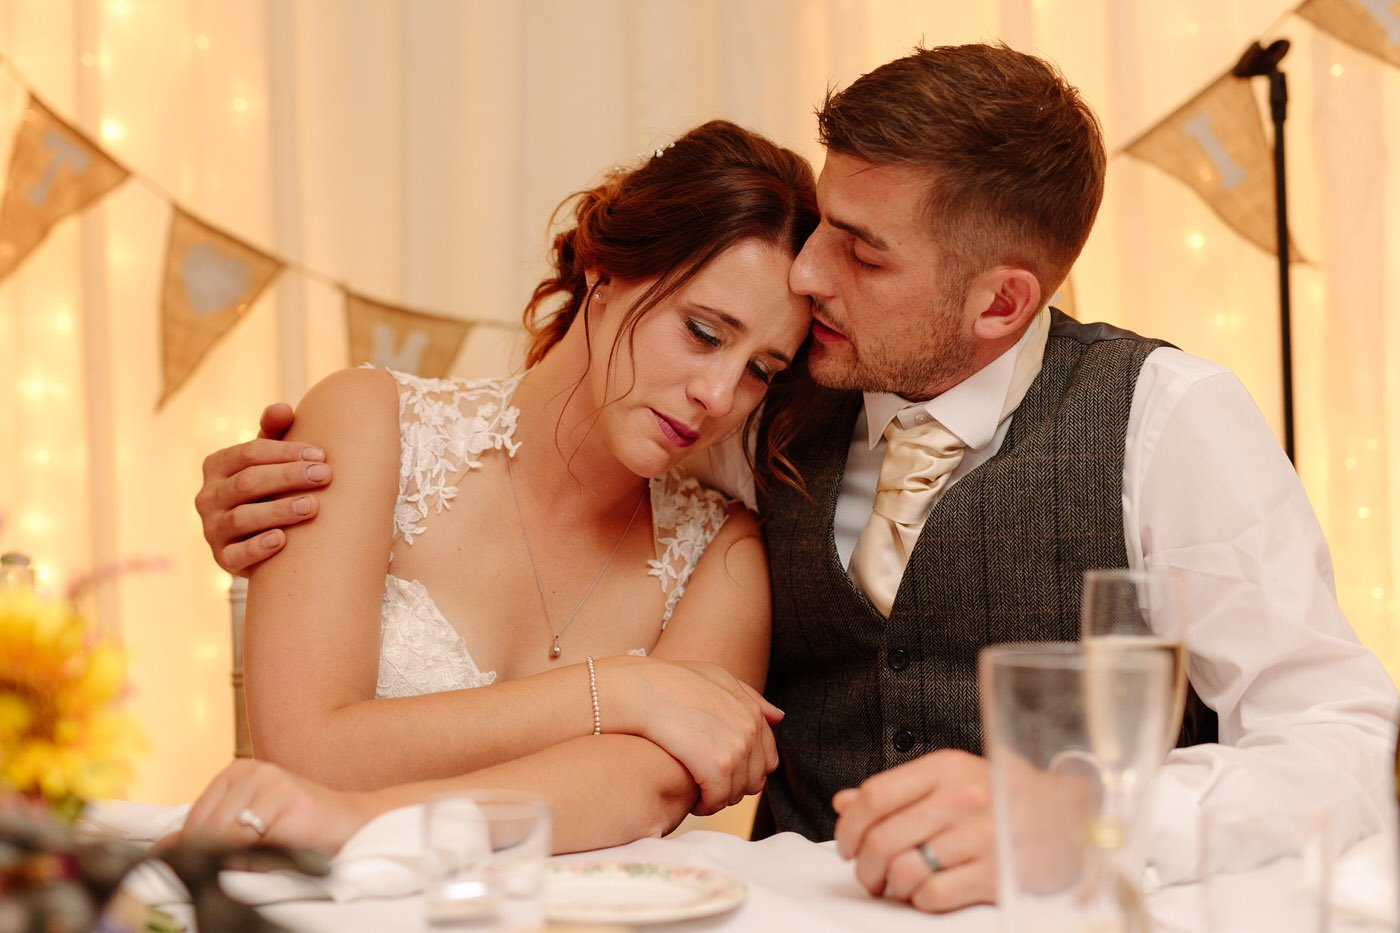 AA PENTREMAWRNORTH WALES WEDDING 2268